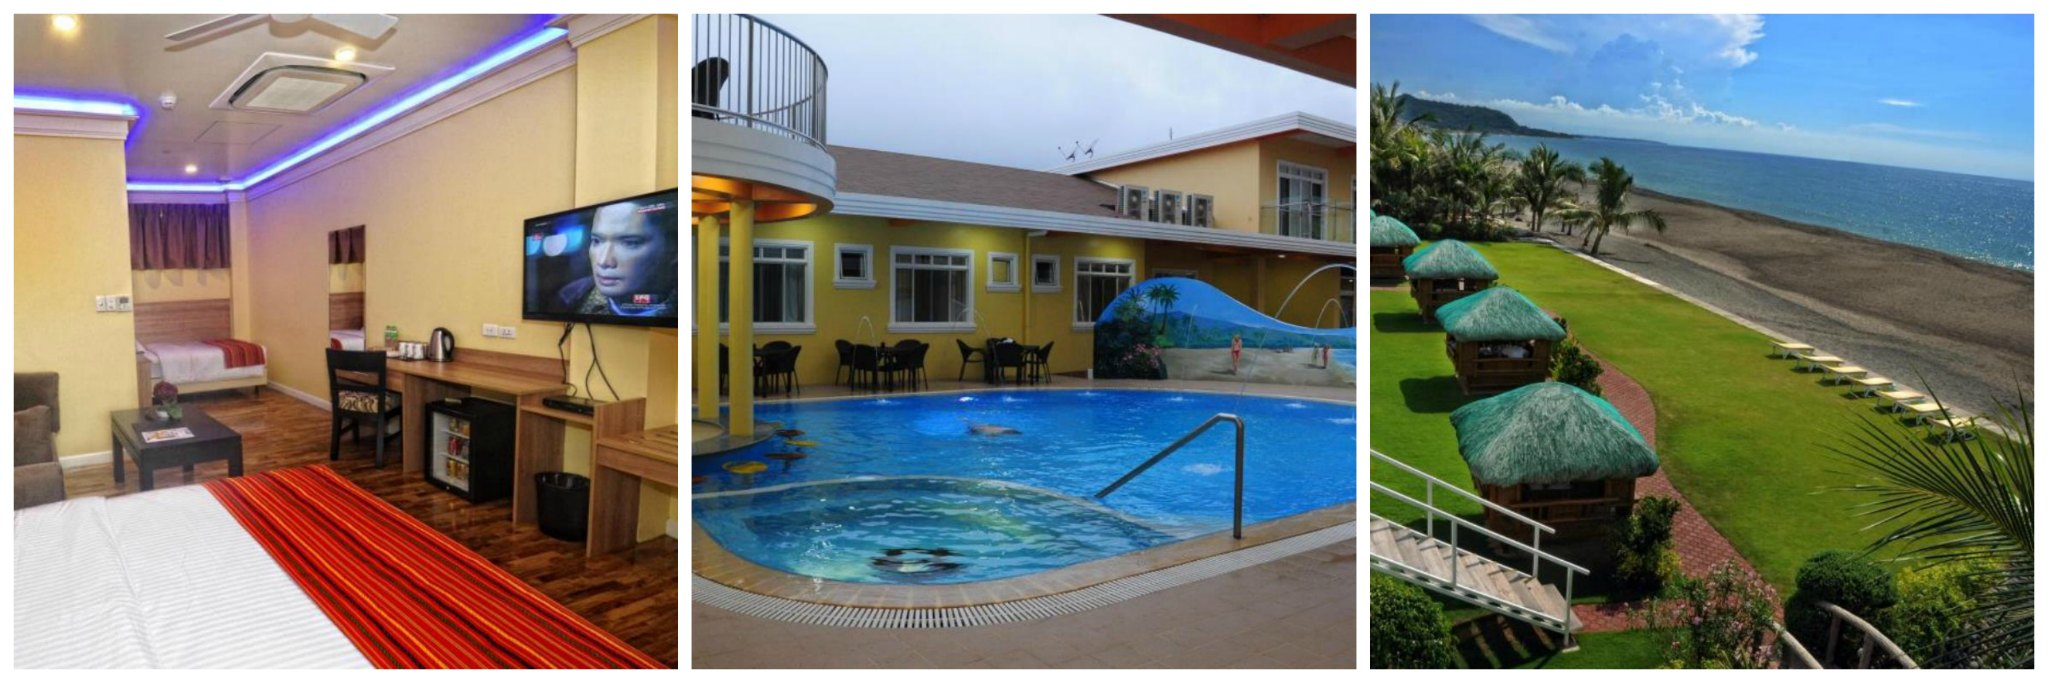 Aureo Resort Room Rates